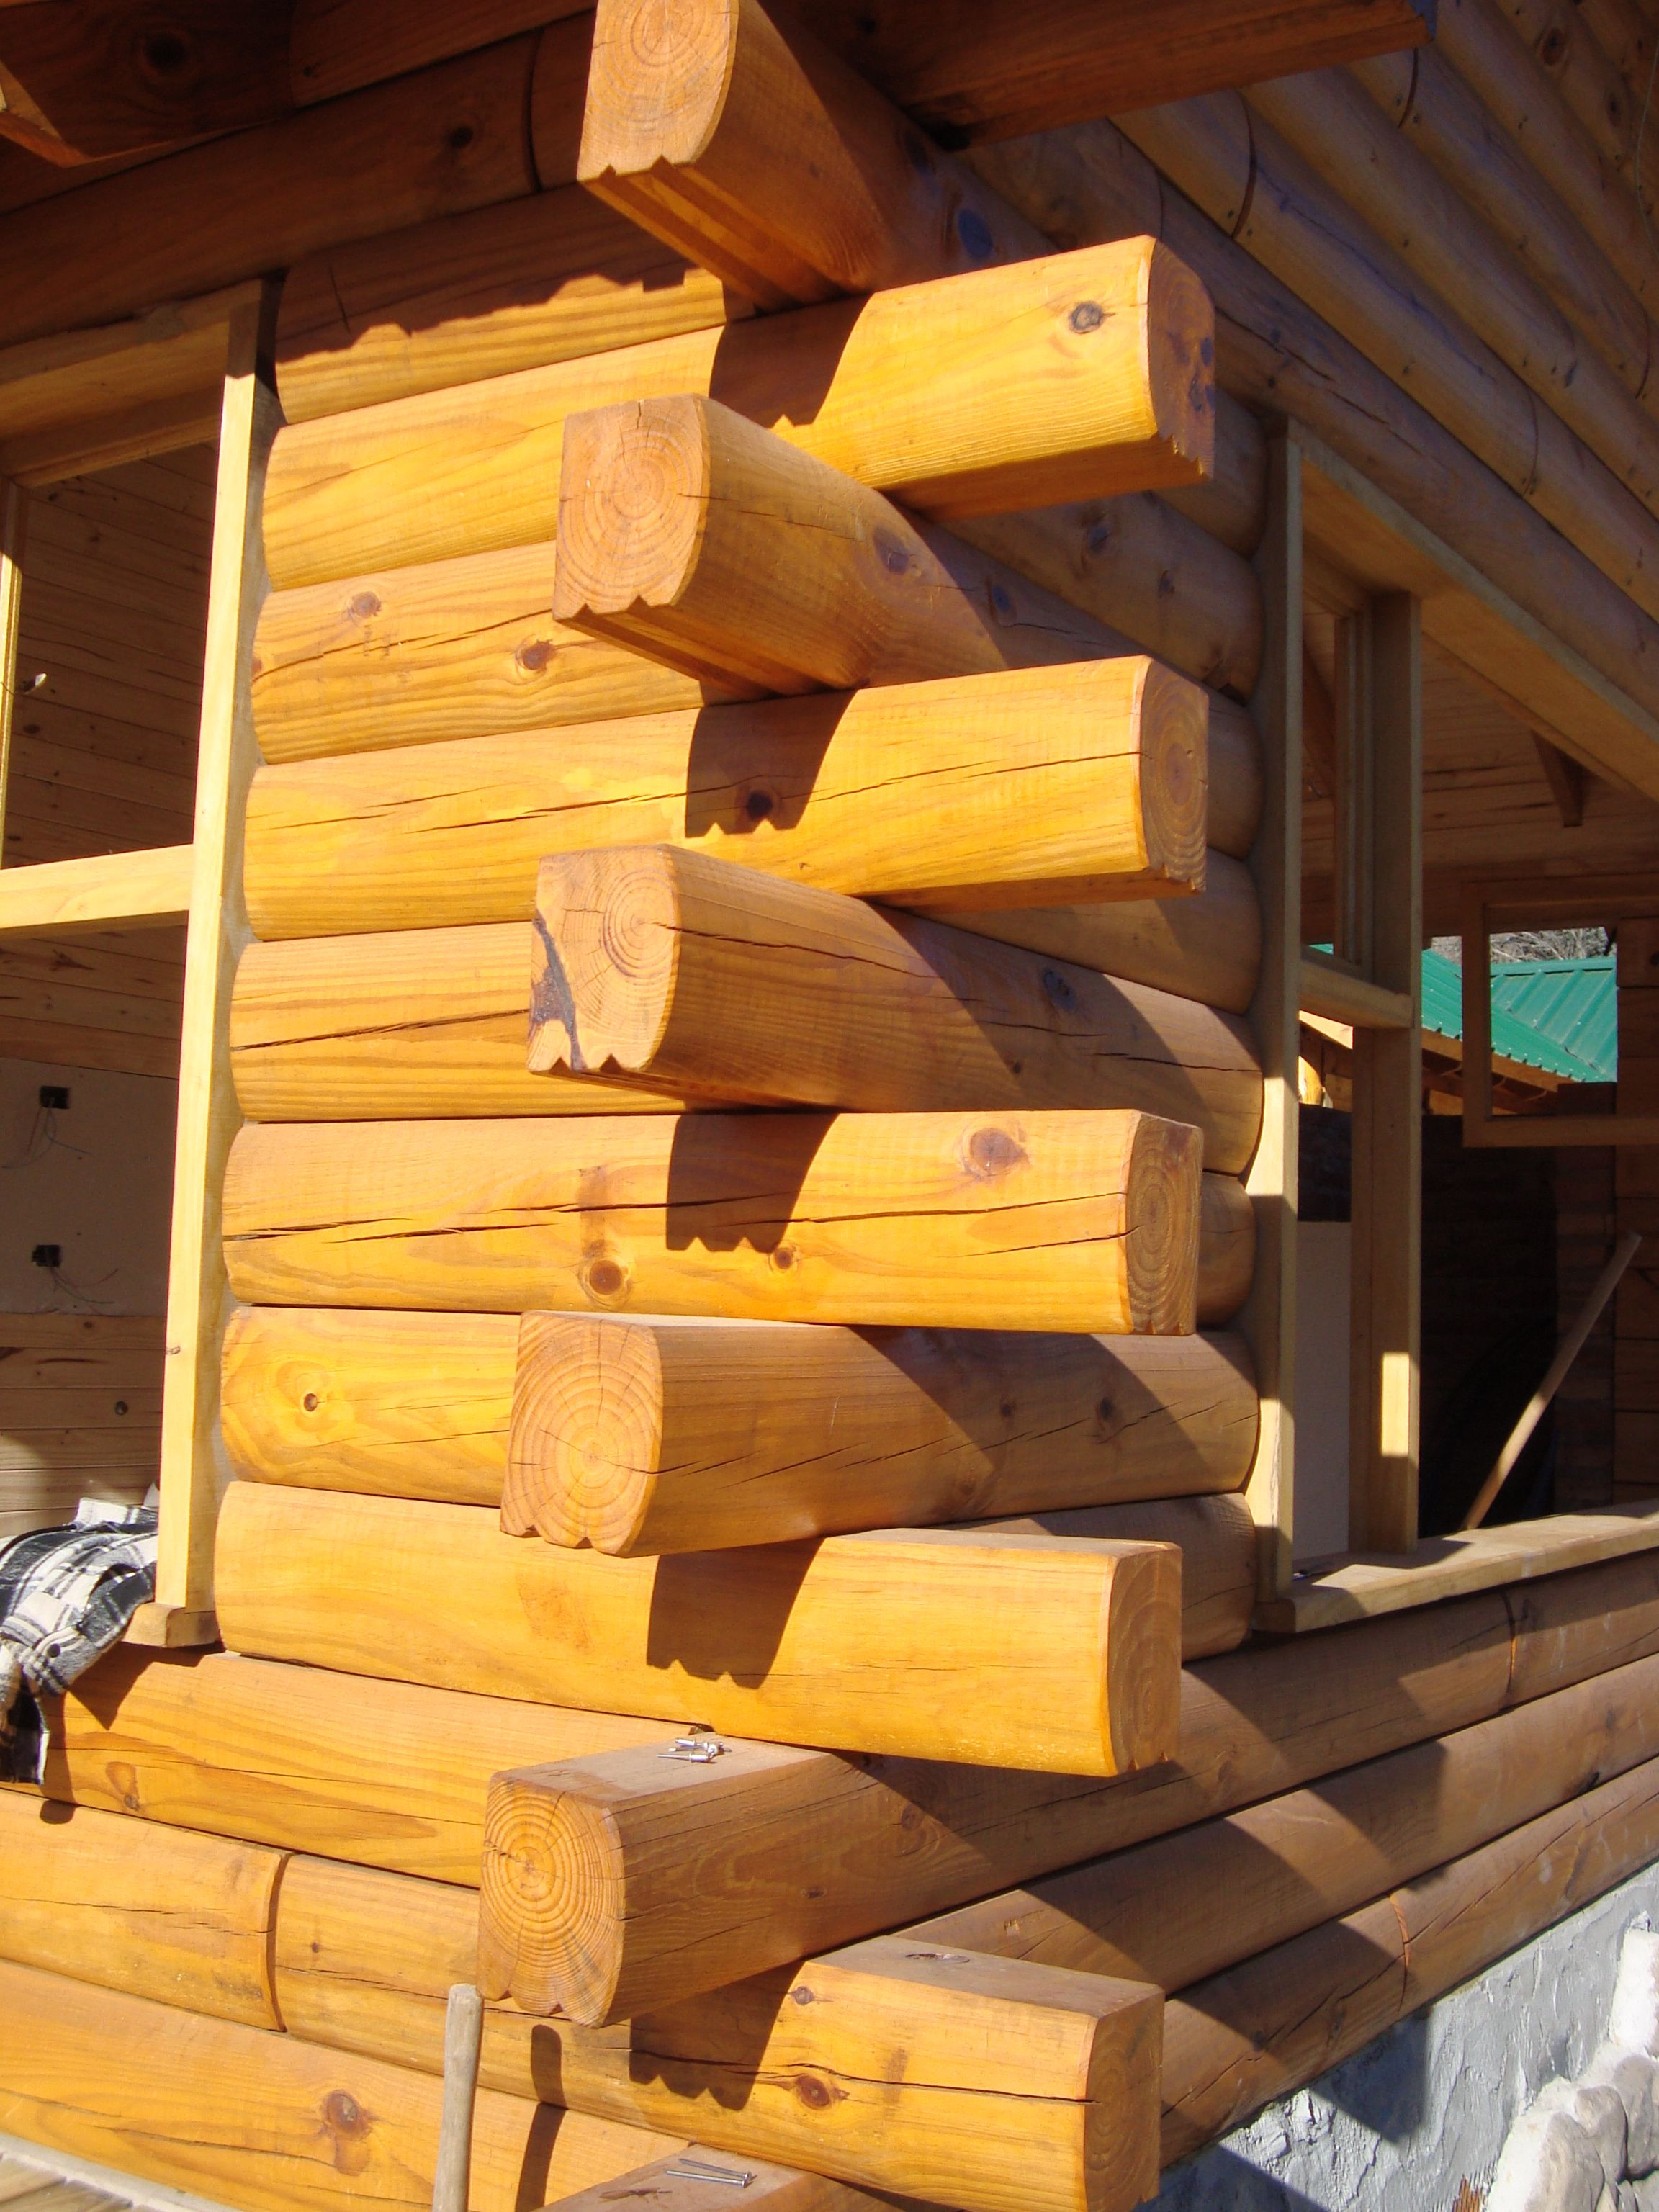 Pared de troncos macizos los troncos de 15 x 20 cm son - Casas de madera de pino ...